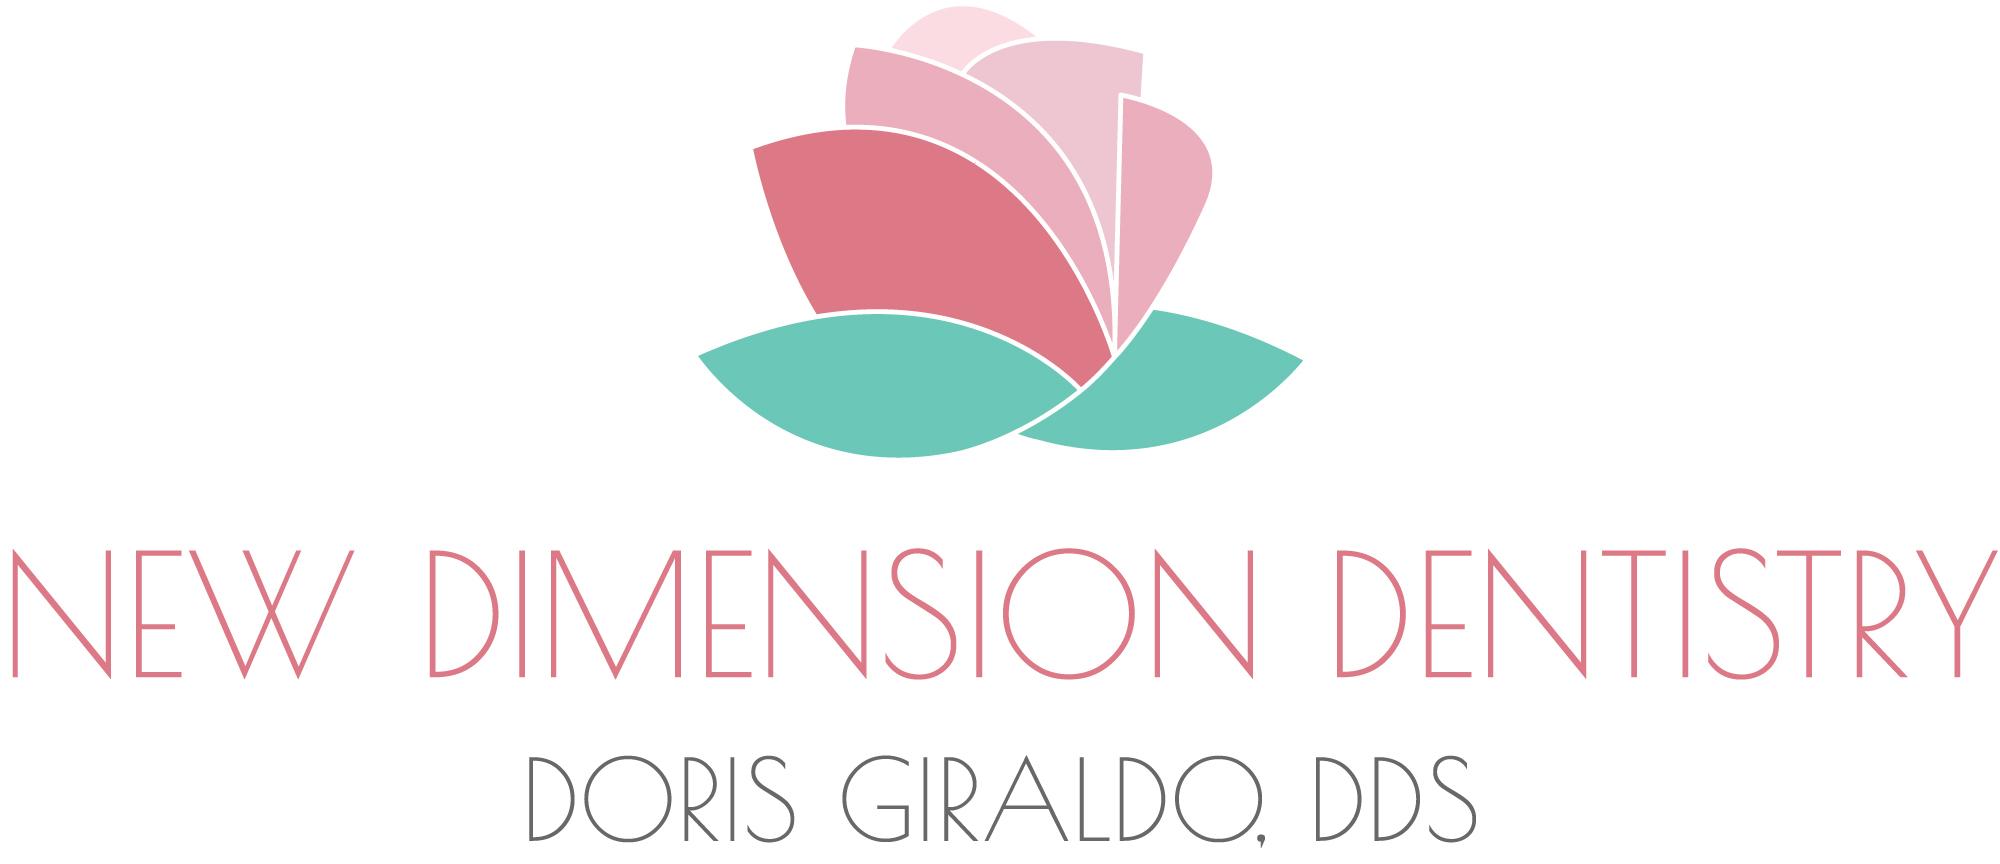 new-dimension-dentistry_logo.jpg